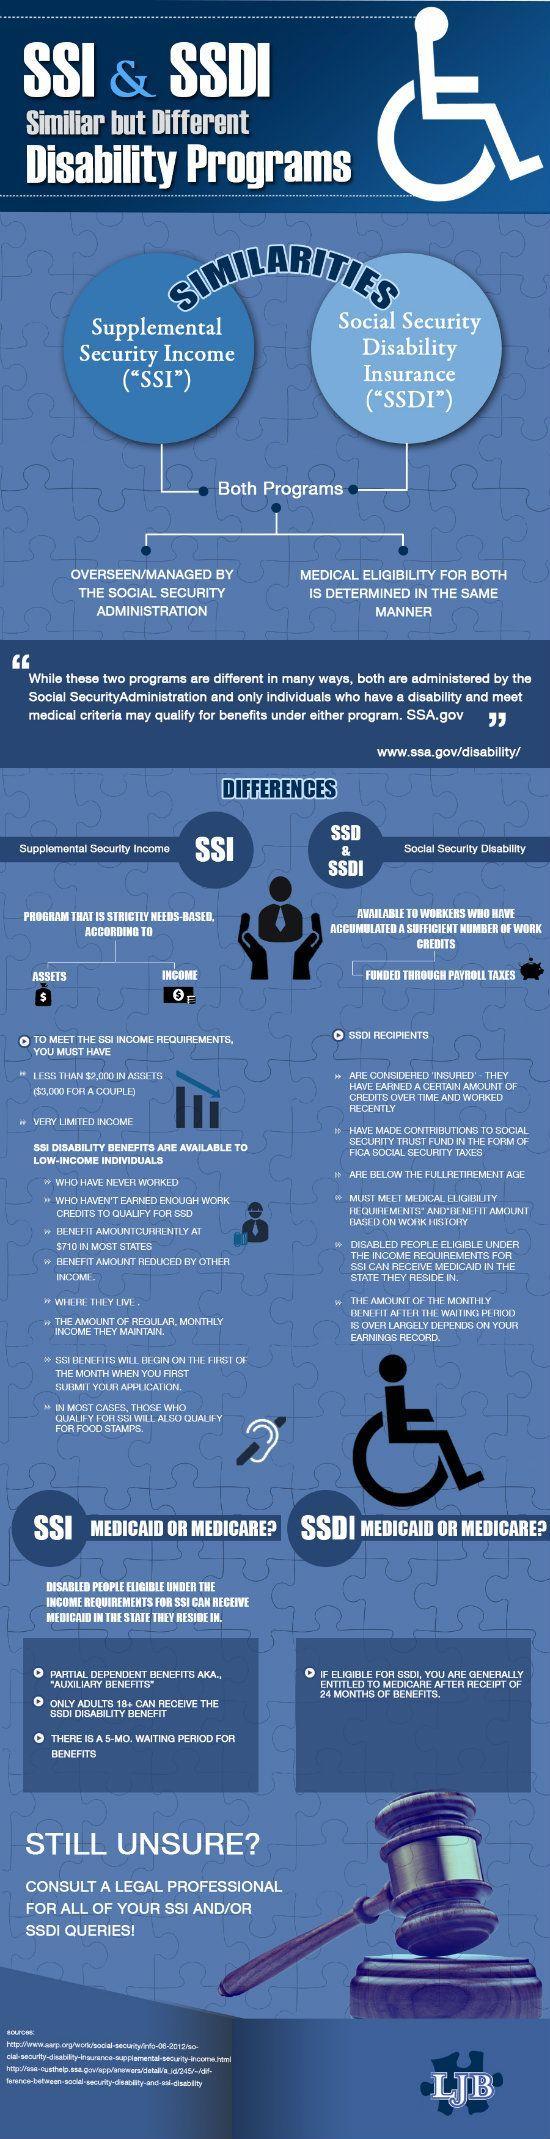 http://www.louisianadisabilitylaw.com/2013/11/ssdi-ssi-similar-but-different-disability-programs/  SSDI and SSI: Similar but Different Disability Programs [Infographic]